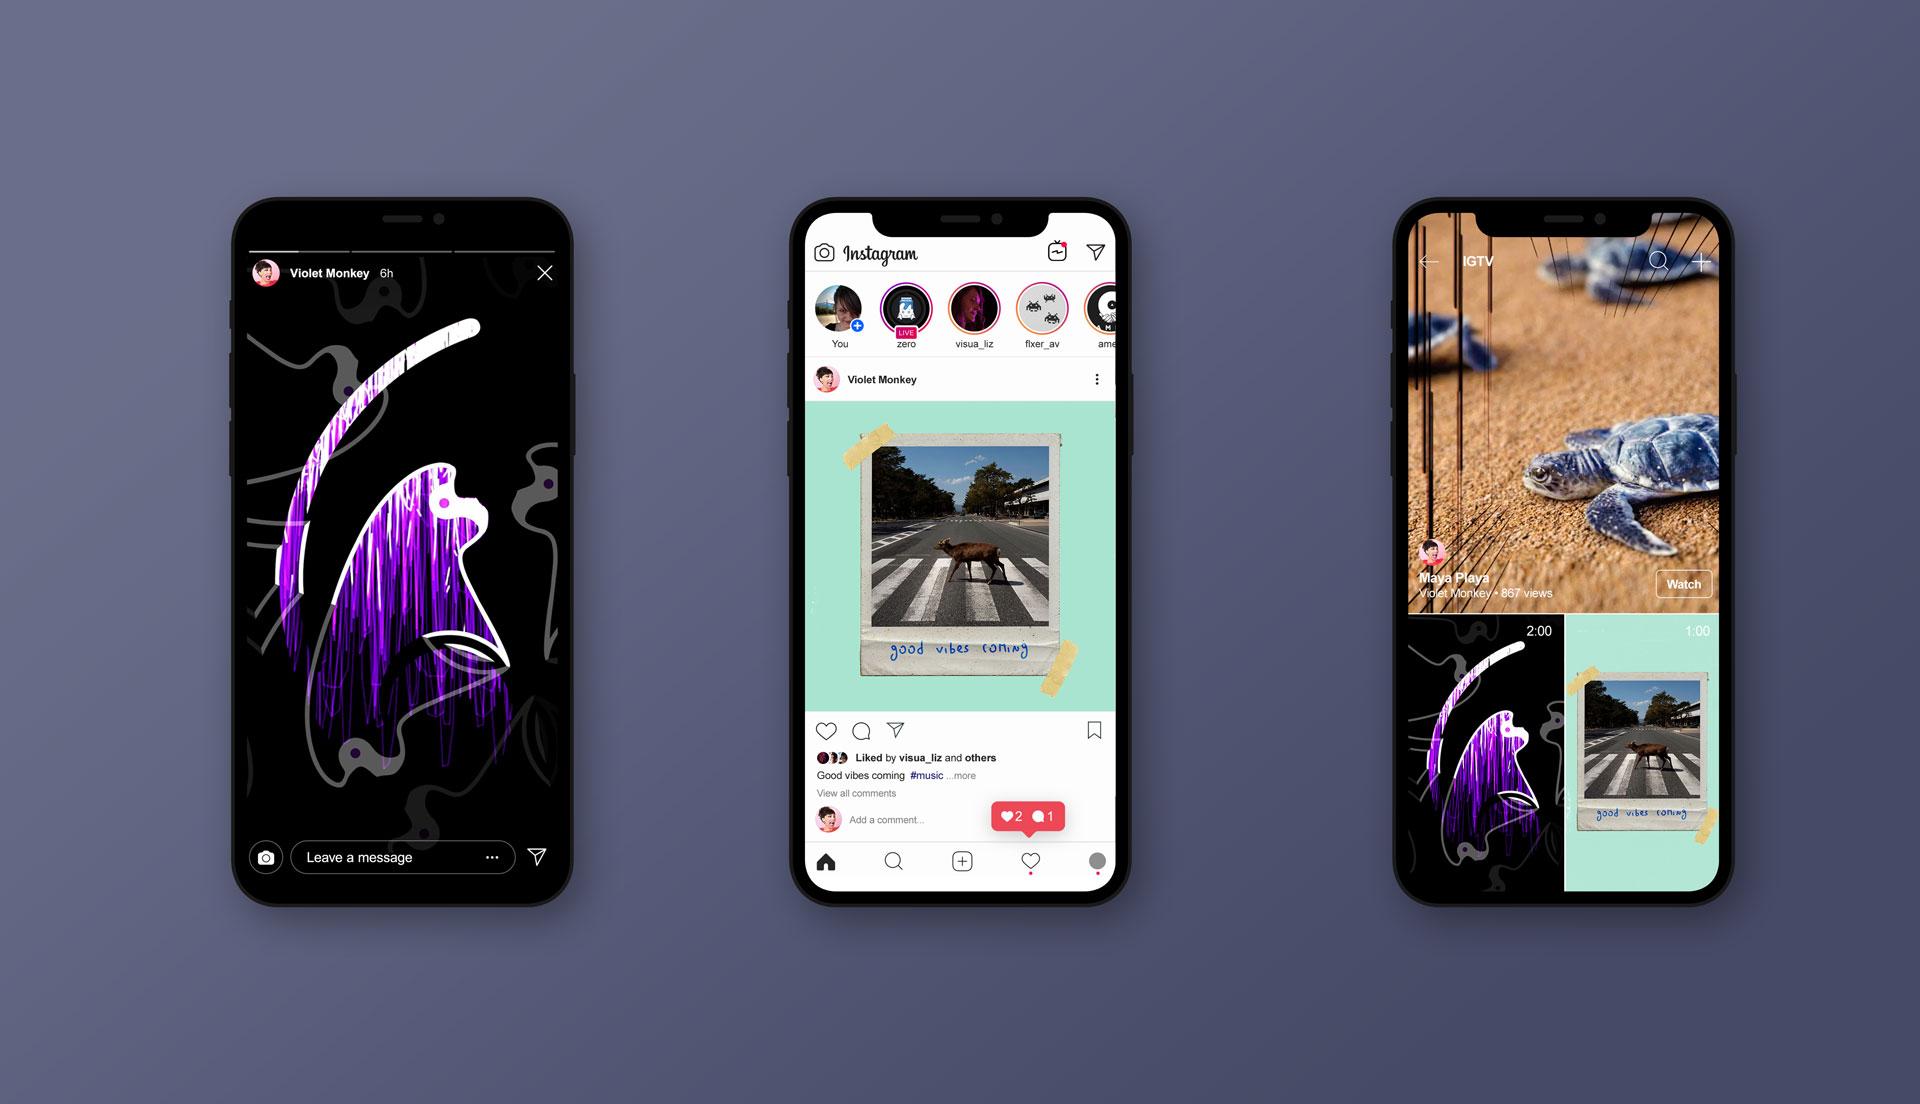 violet-monkey-social